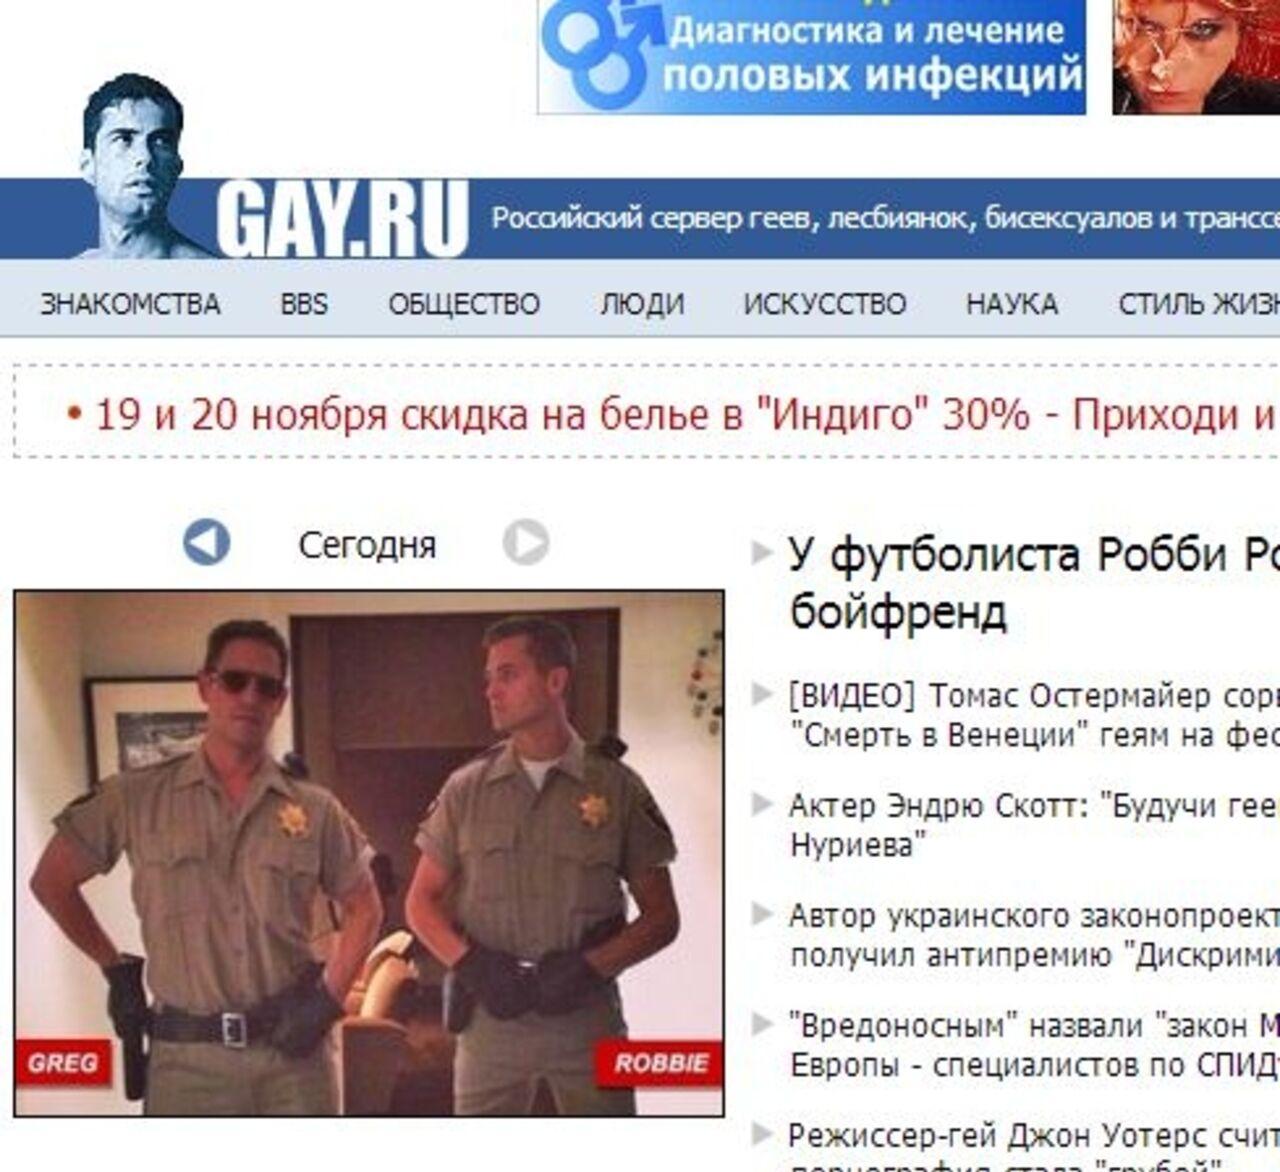 gey-ru-znakomstva